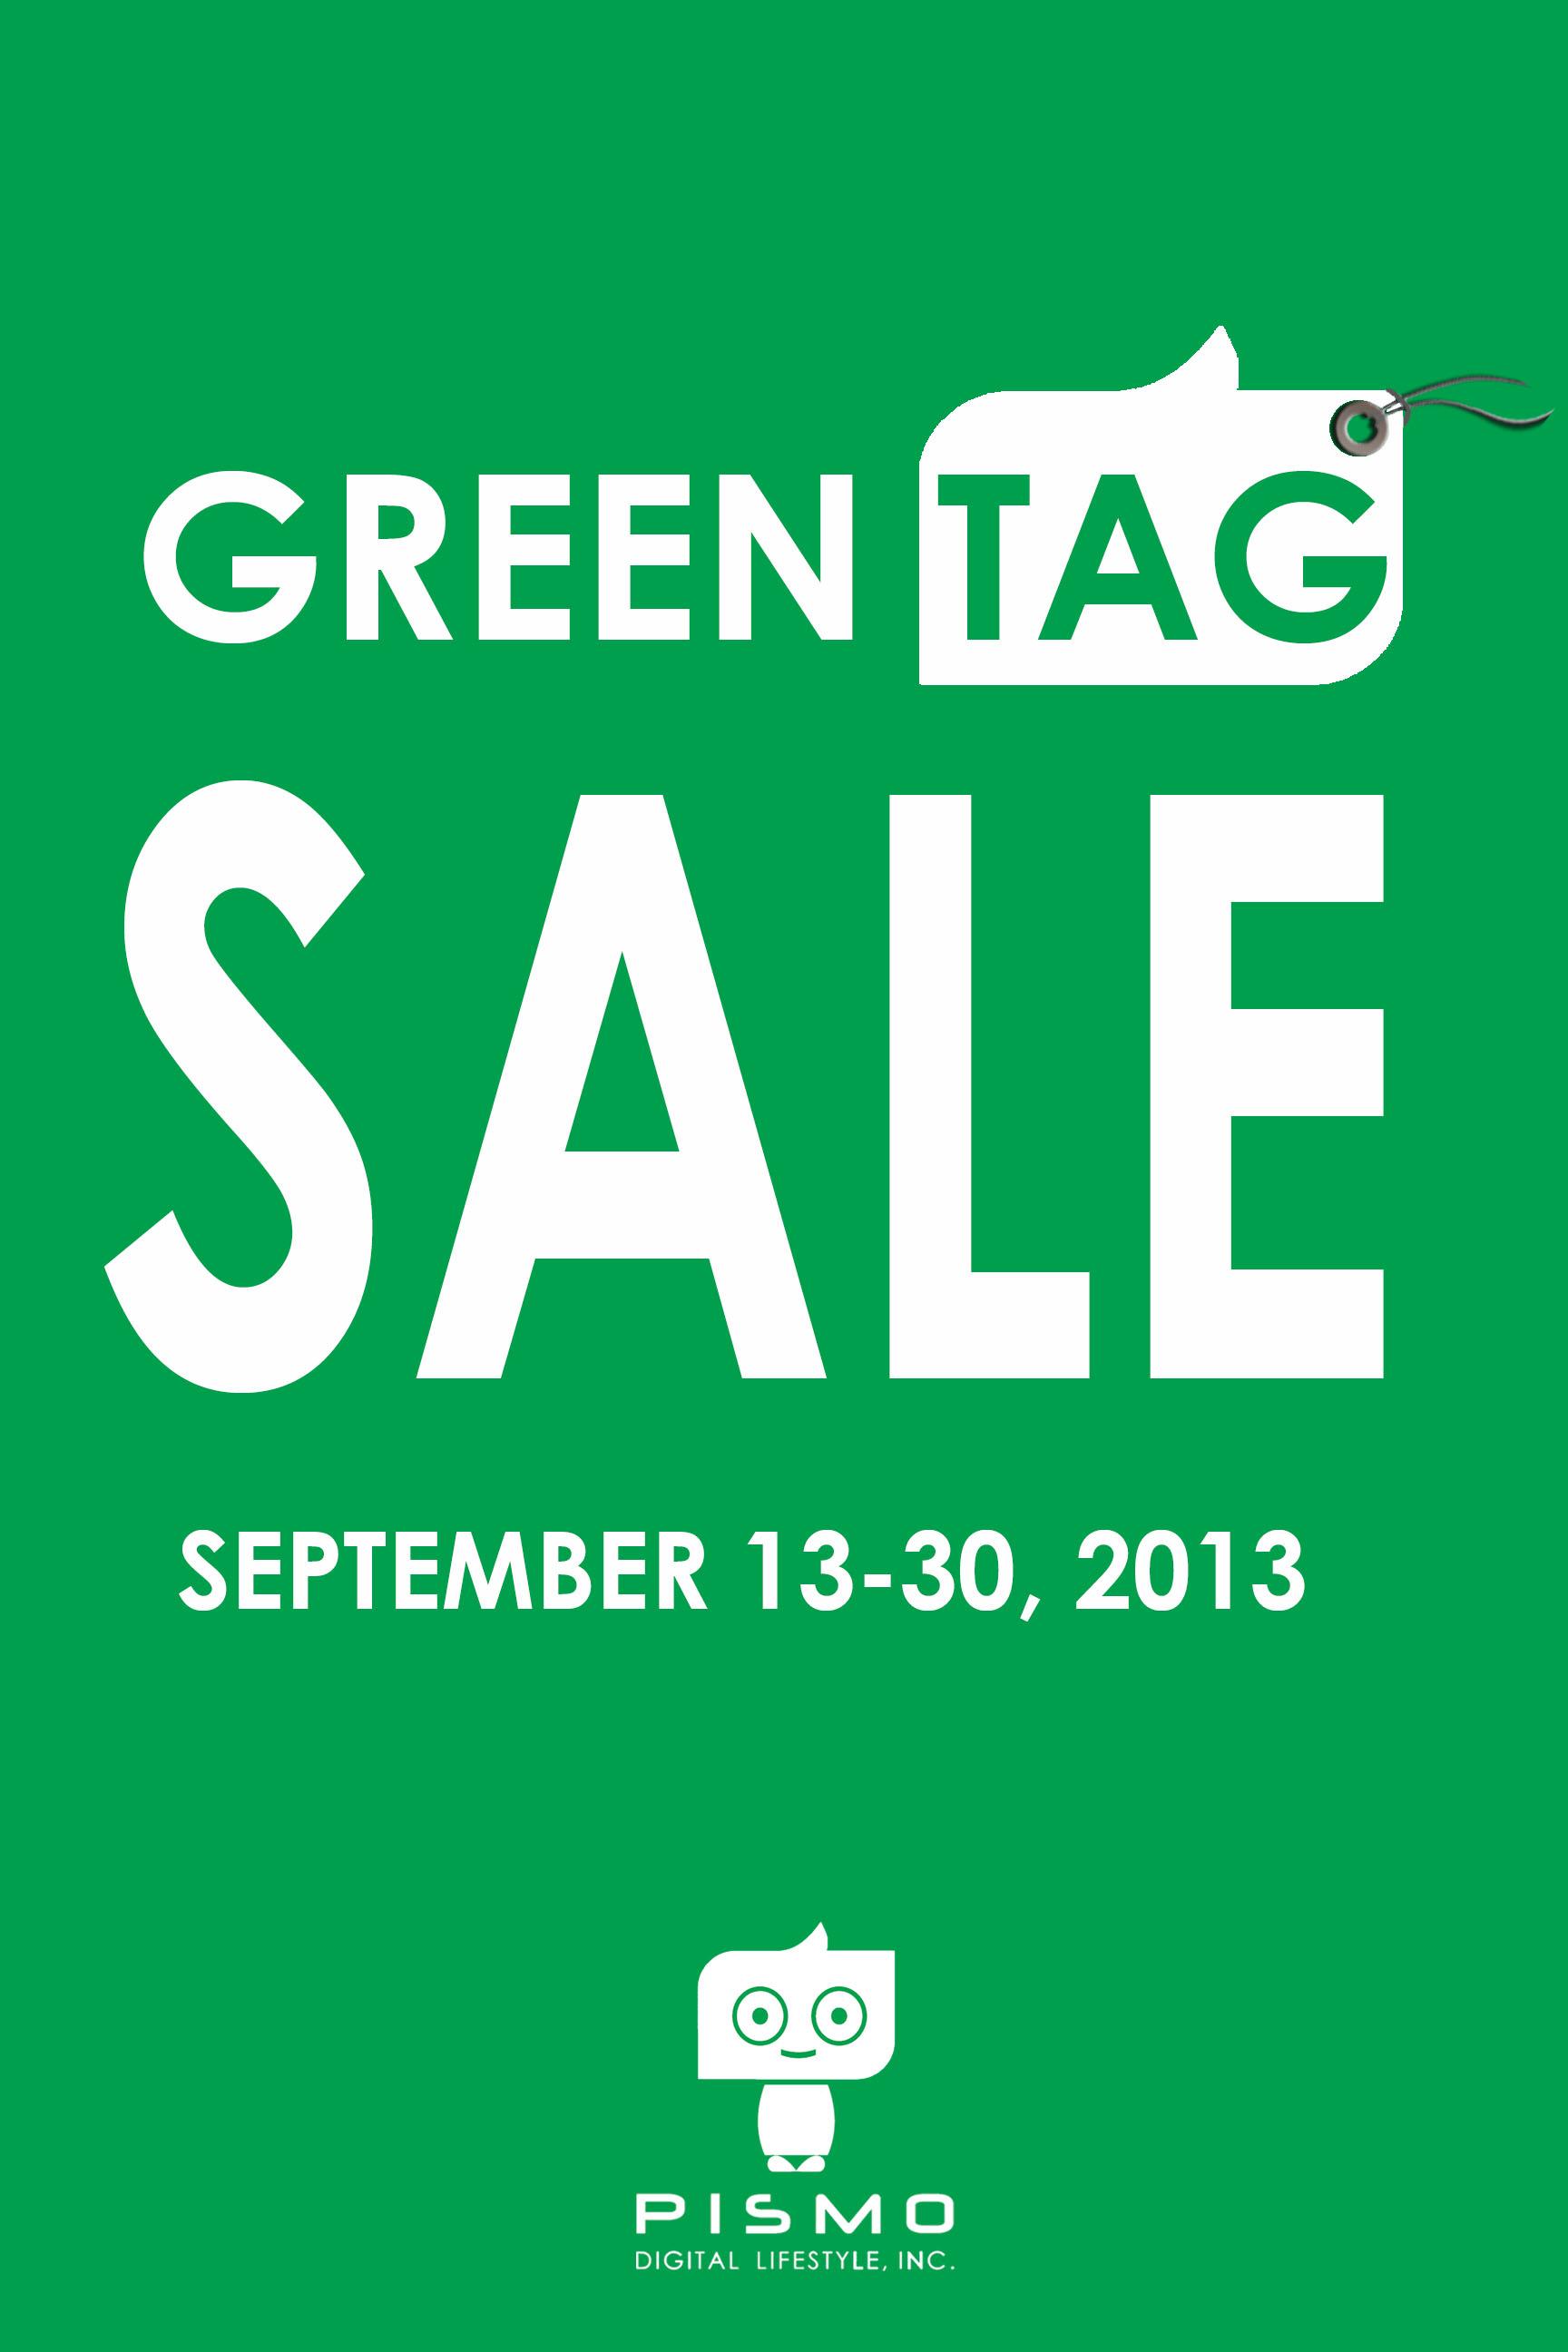 Pismo Digital Lifestyle Green Tag Sale September 2013